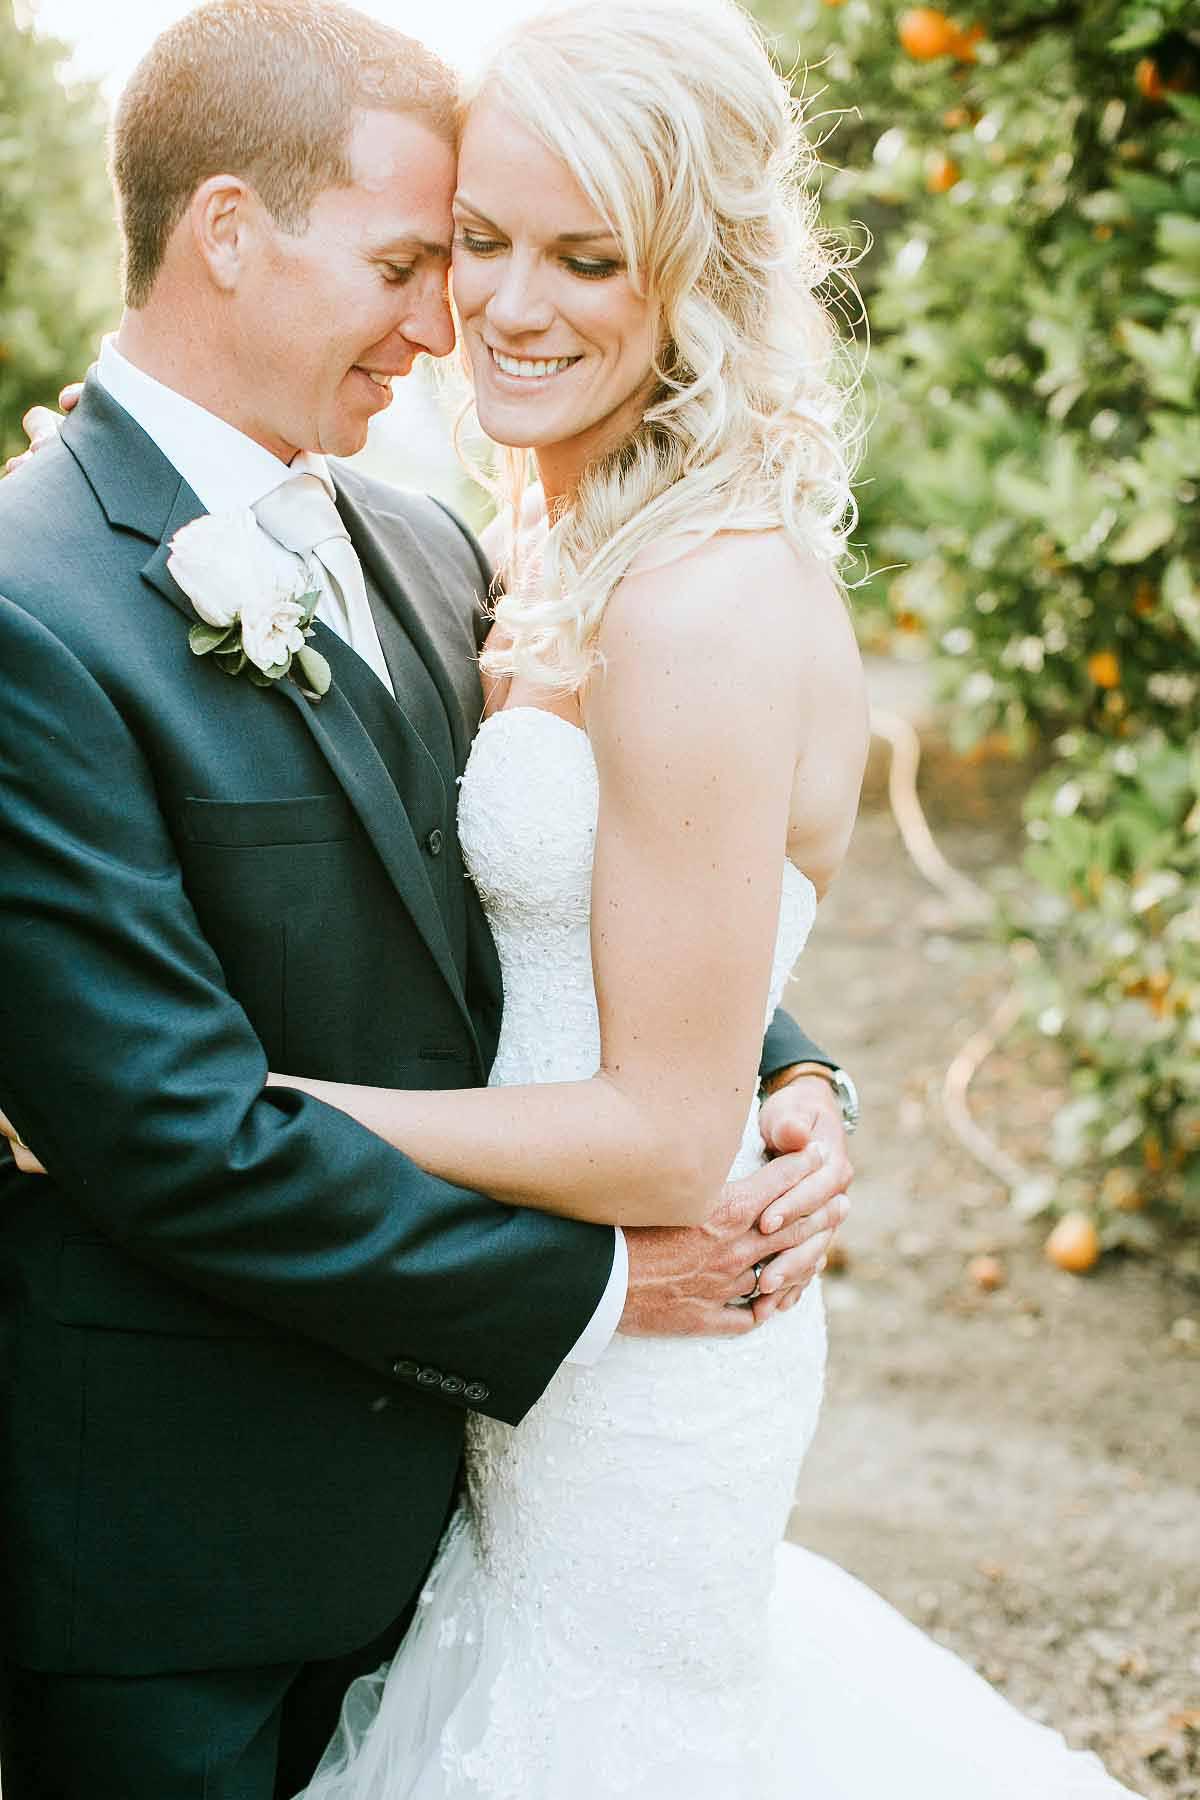 Bryllupsfotograf Vejle | bryllupsfotograf - dit bryllup